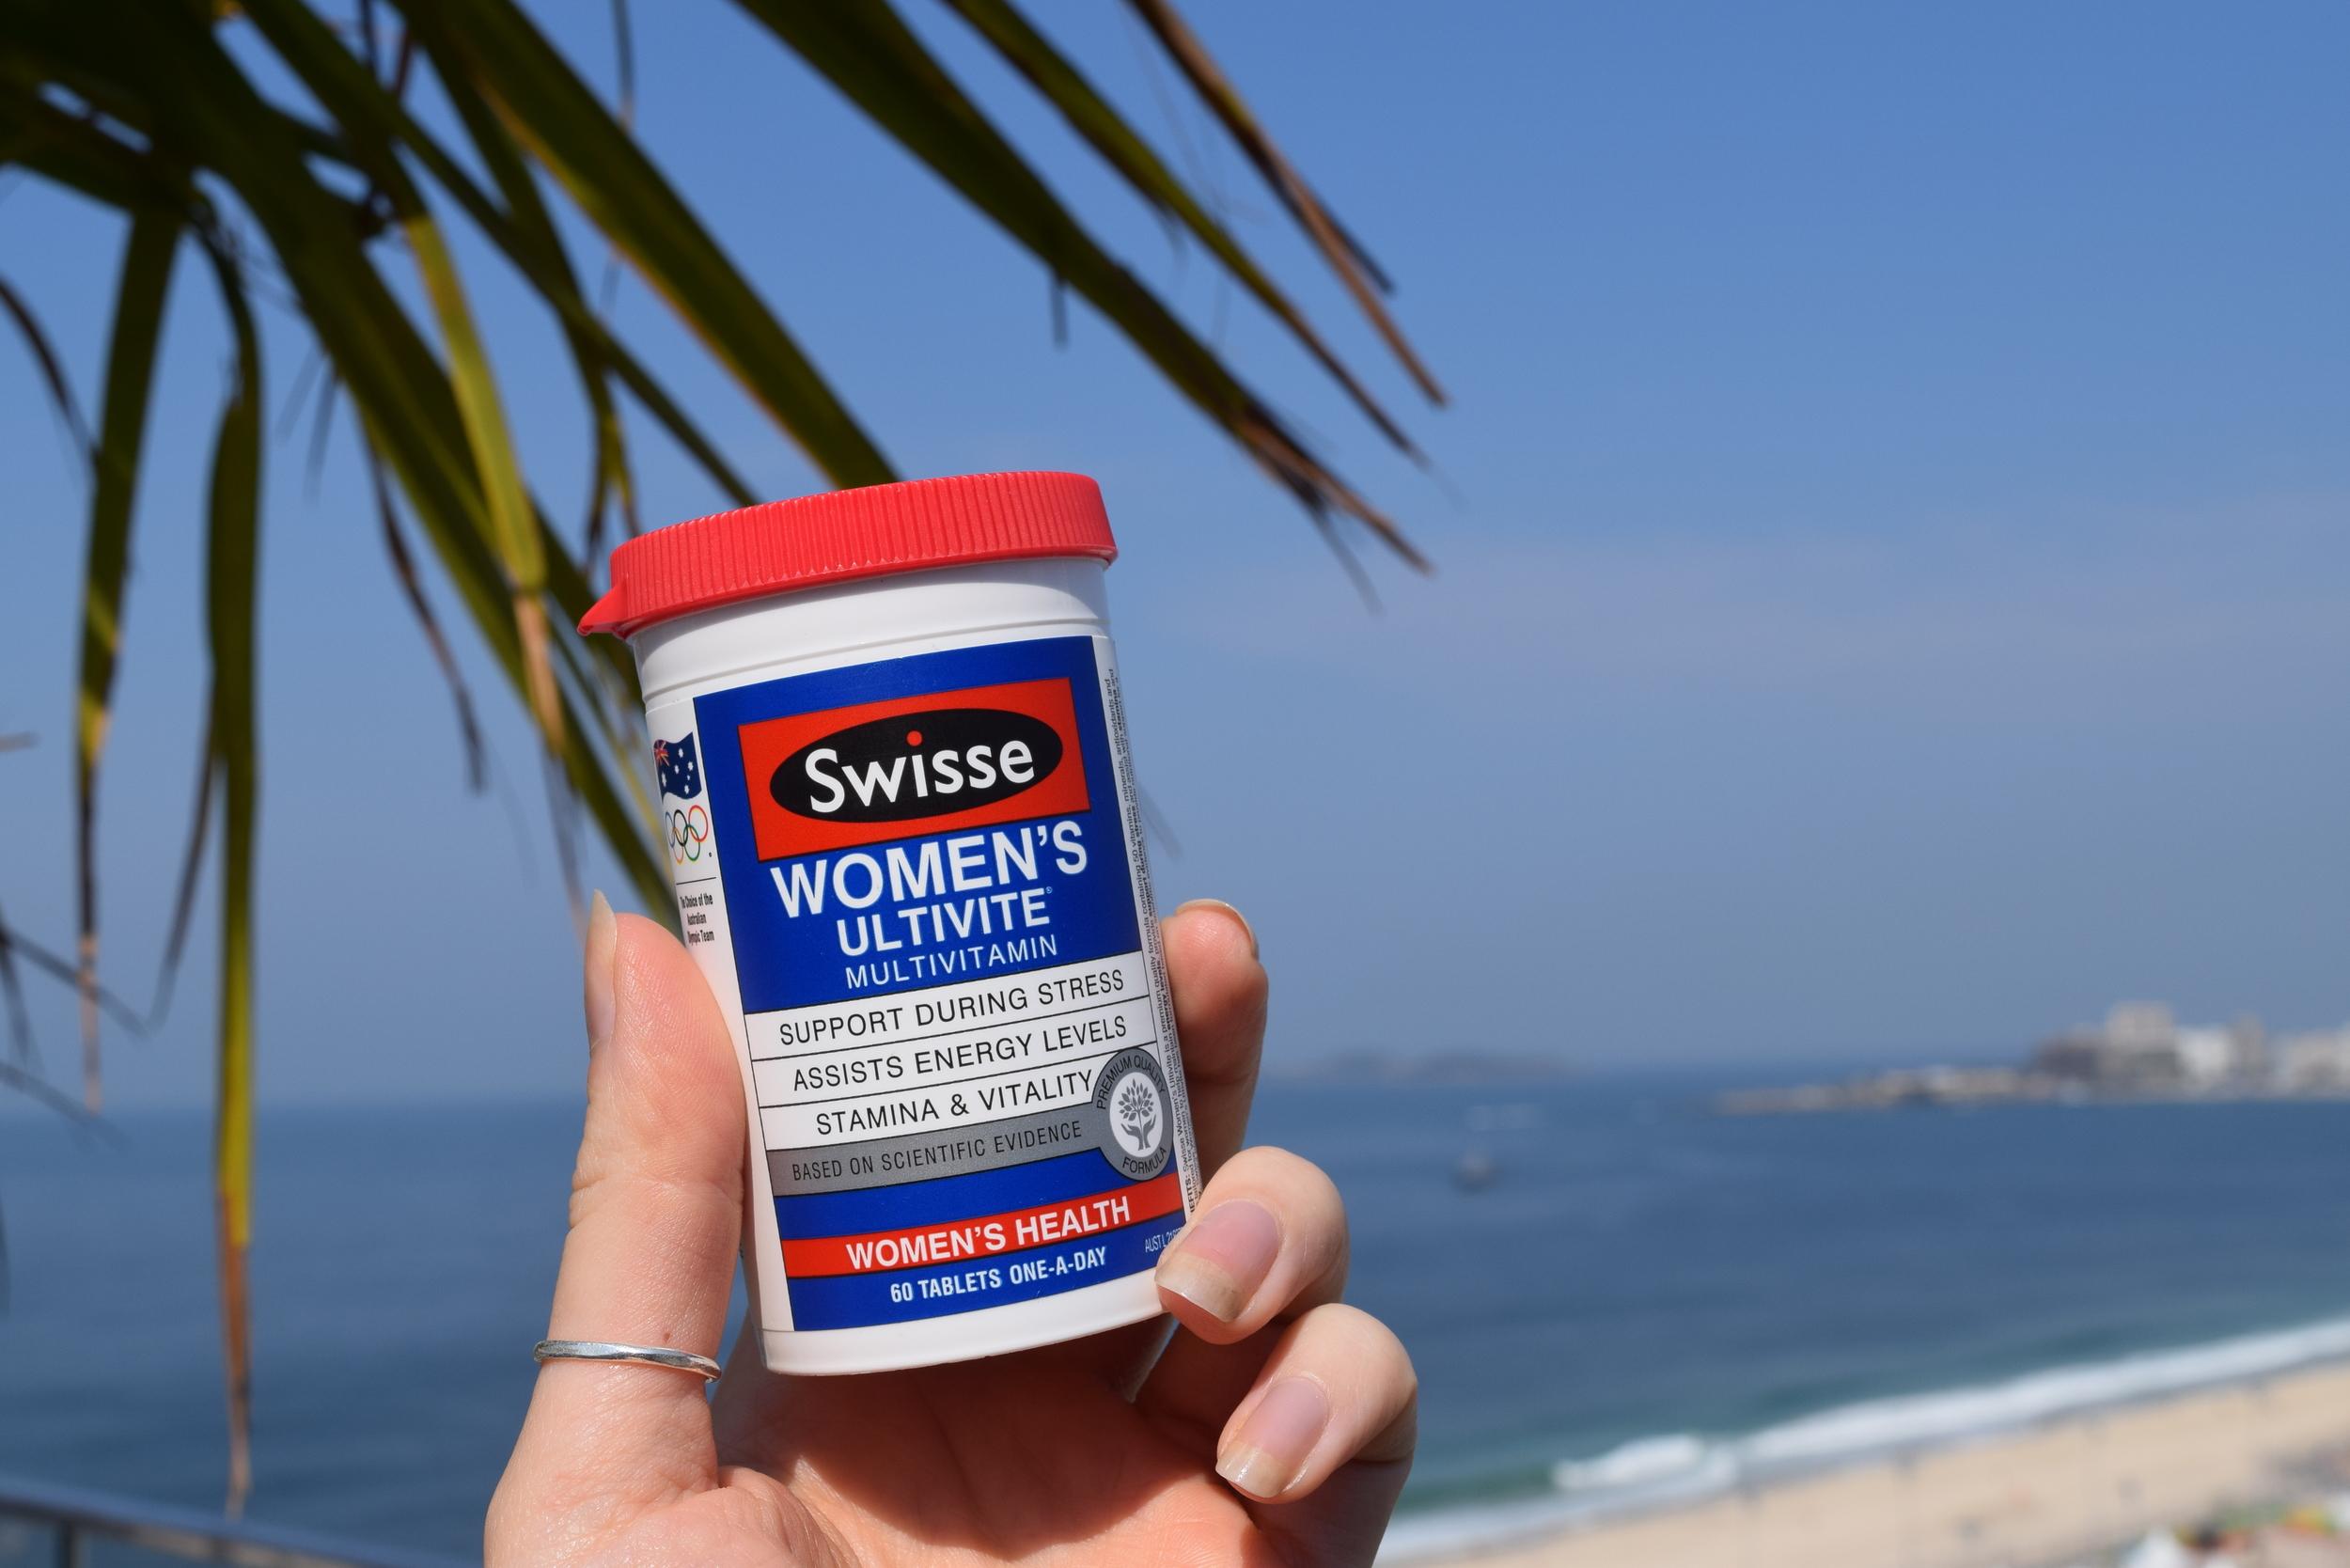 Swisse-Vitamins-Multi-Fitness-Blogger-Nutrition-Rio-Olympics